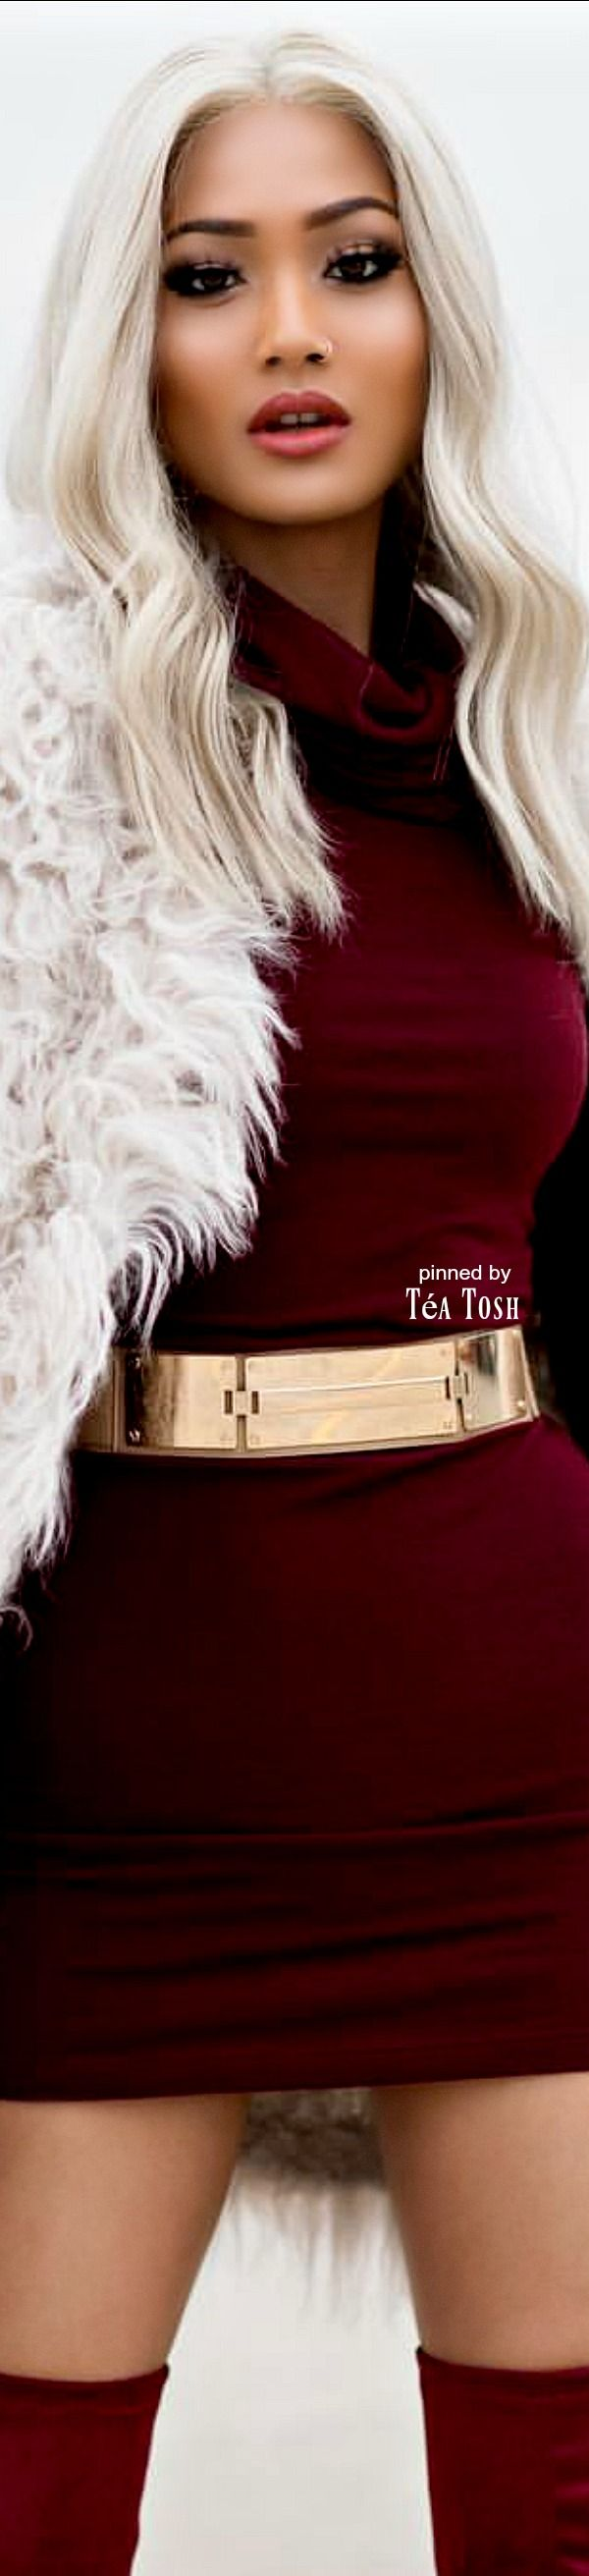 ( 2016 ) ☞ Hot Beautiful Girl ☆ TEA TOSH in a Miniskirt. ) ☆ Téa Tosh - ., .